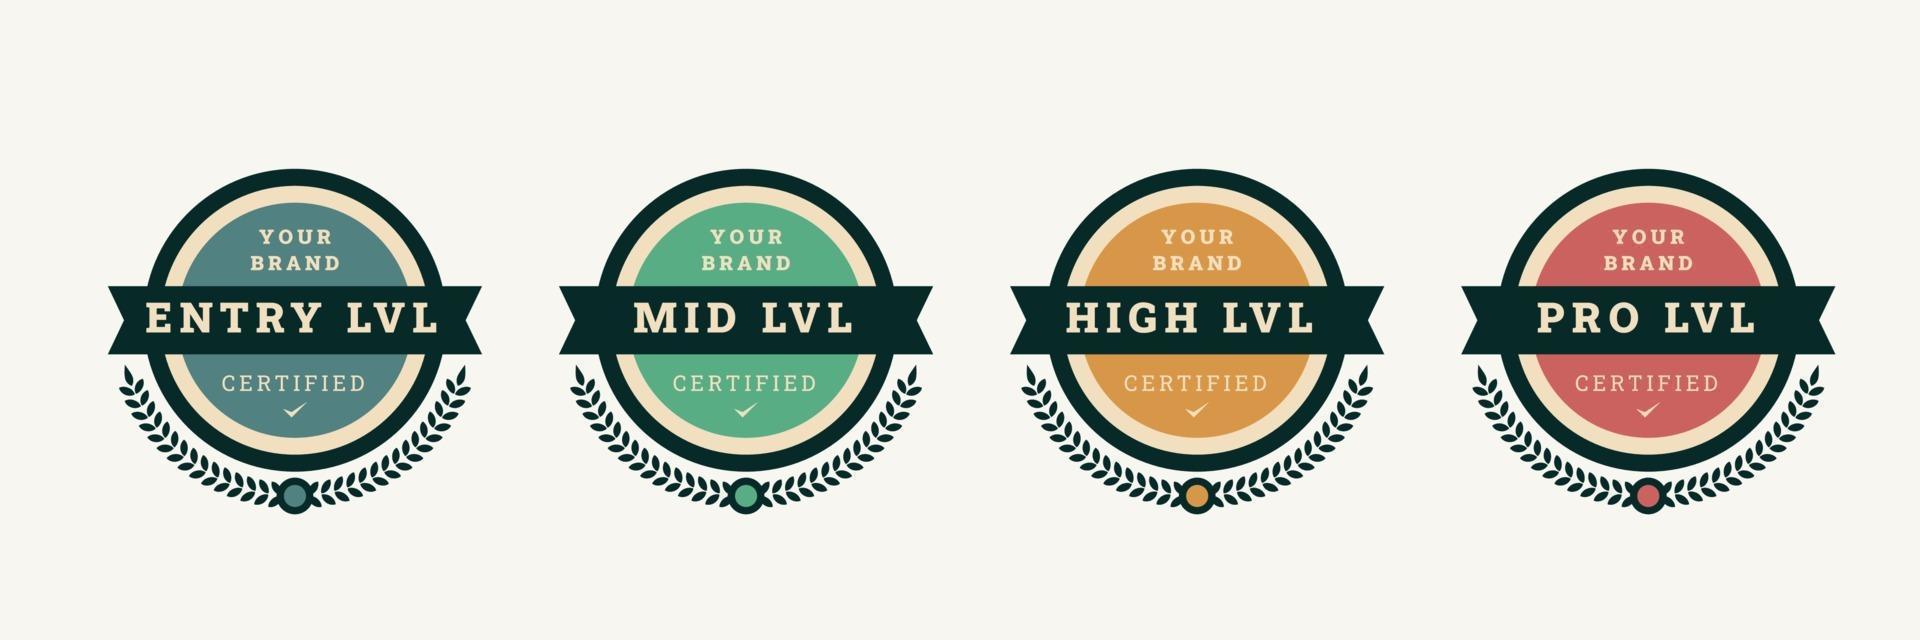 digital certifierad logotyp badge mall. certifieringsemblem med vintage konceptdesign. vektor illustration.